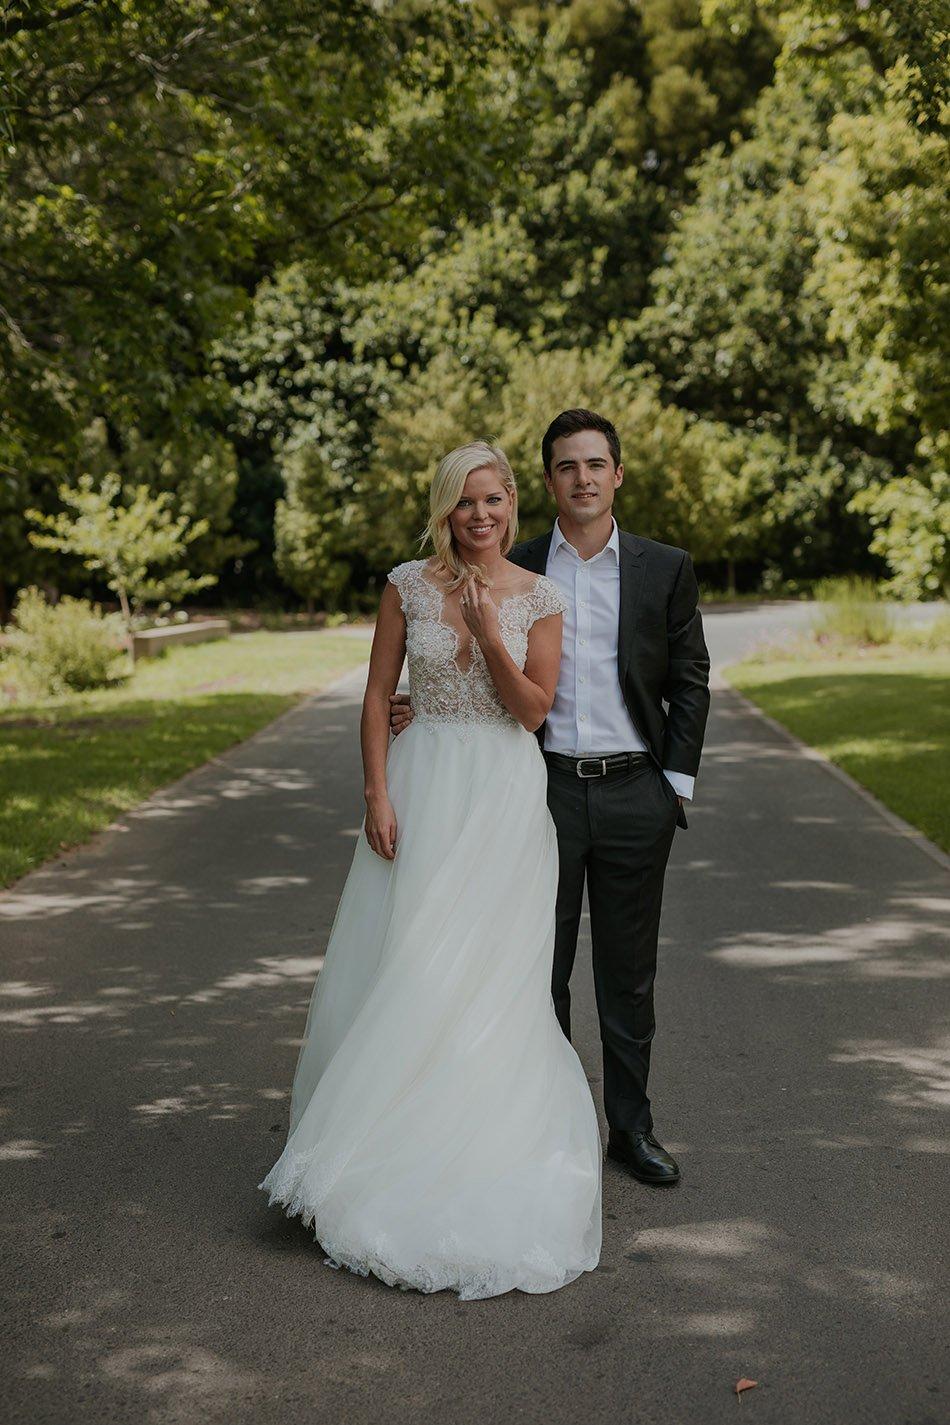 Lourensford Wedding - Duane Smith Photography - Cape Town - Somerset West Wedding Photographer -_